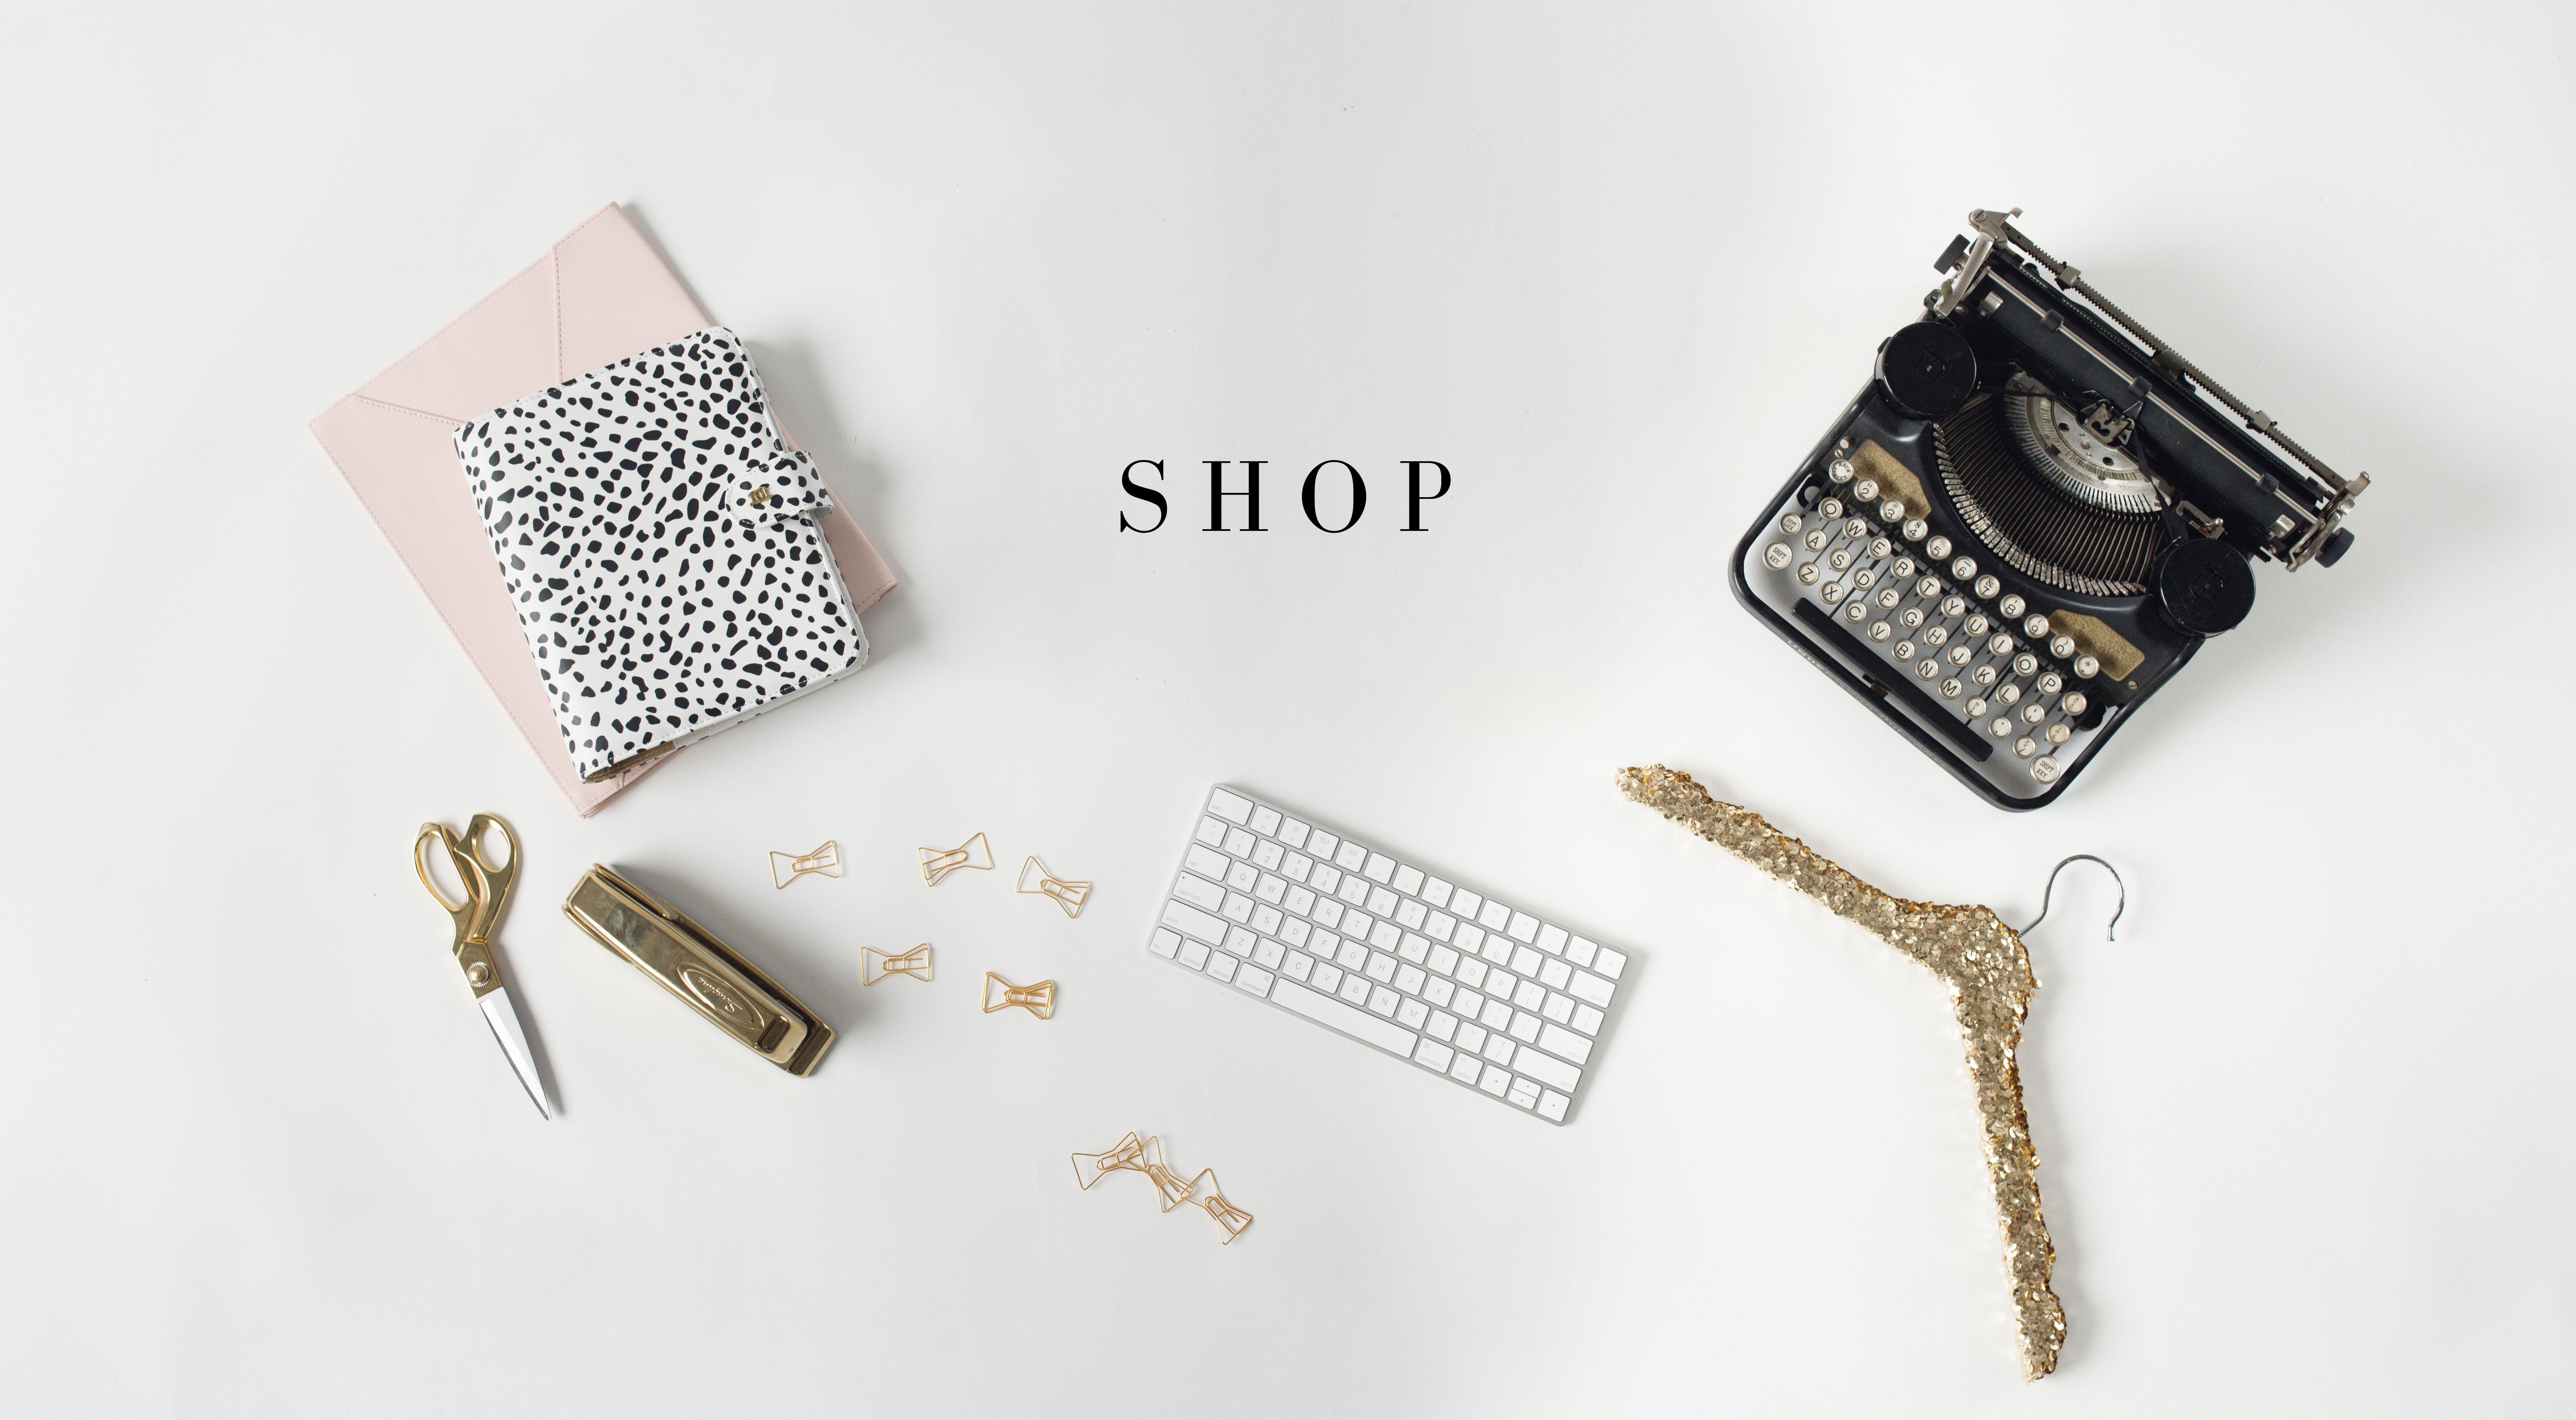 Chic and Motivational Coffee Mugs, Travel Mugs, Print Art, Apparel, Make Up…